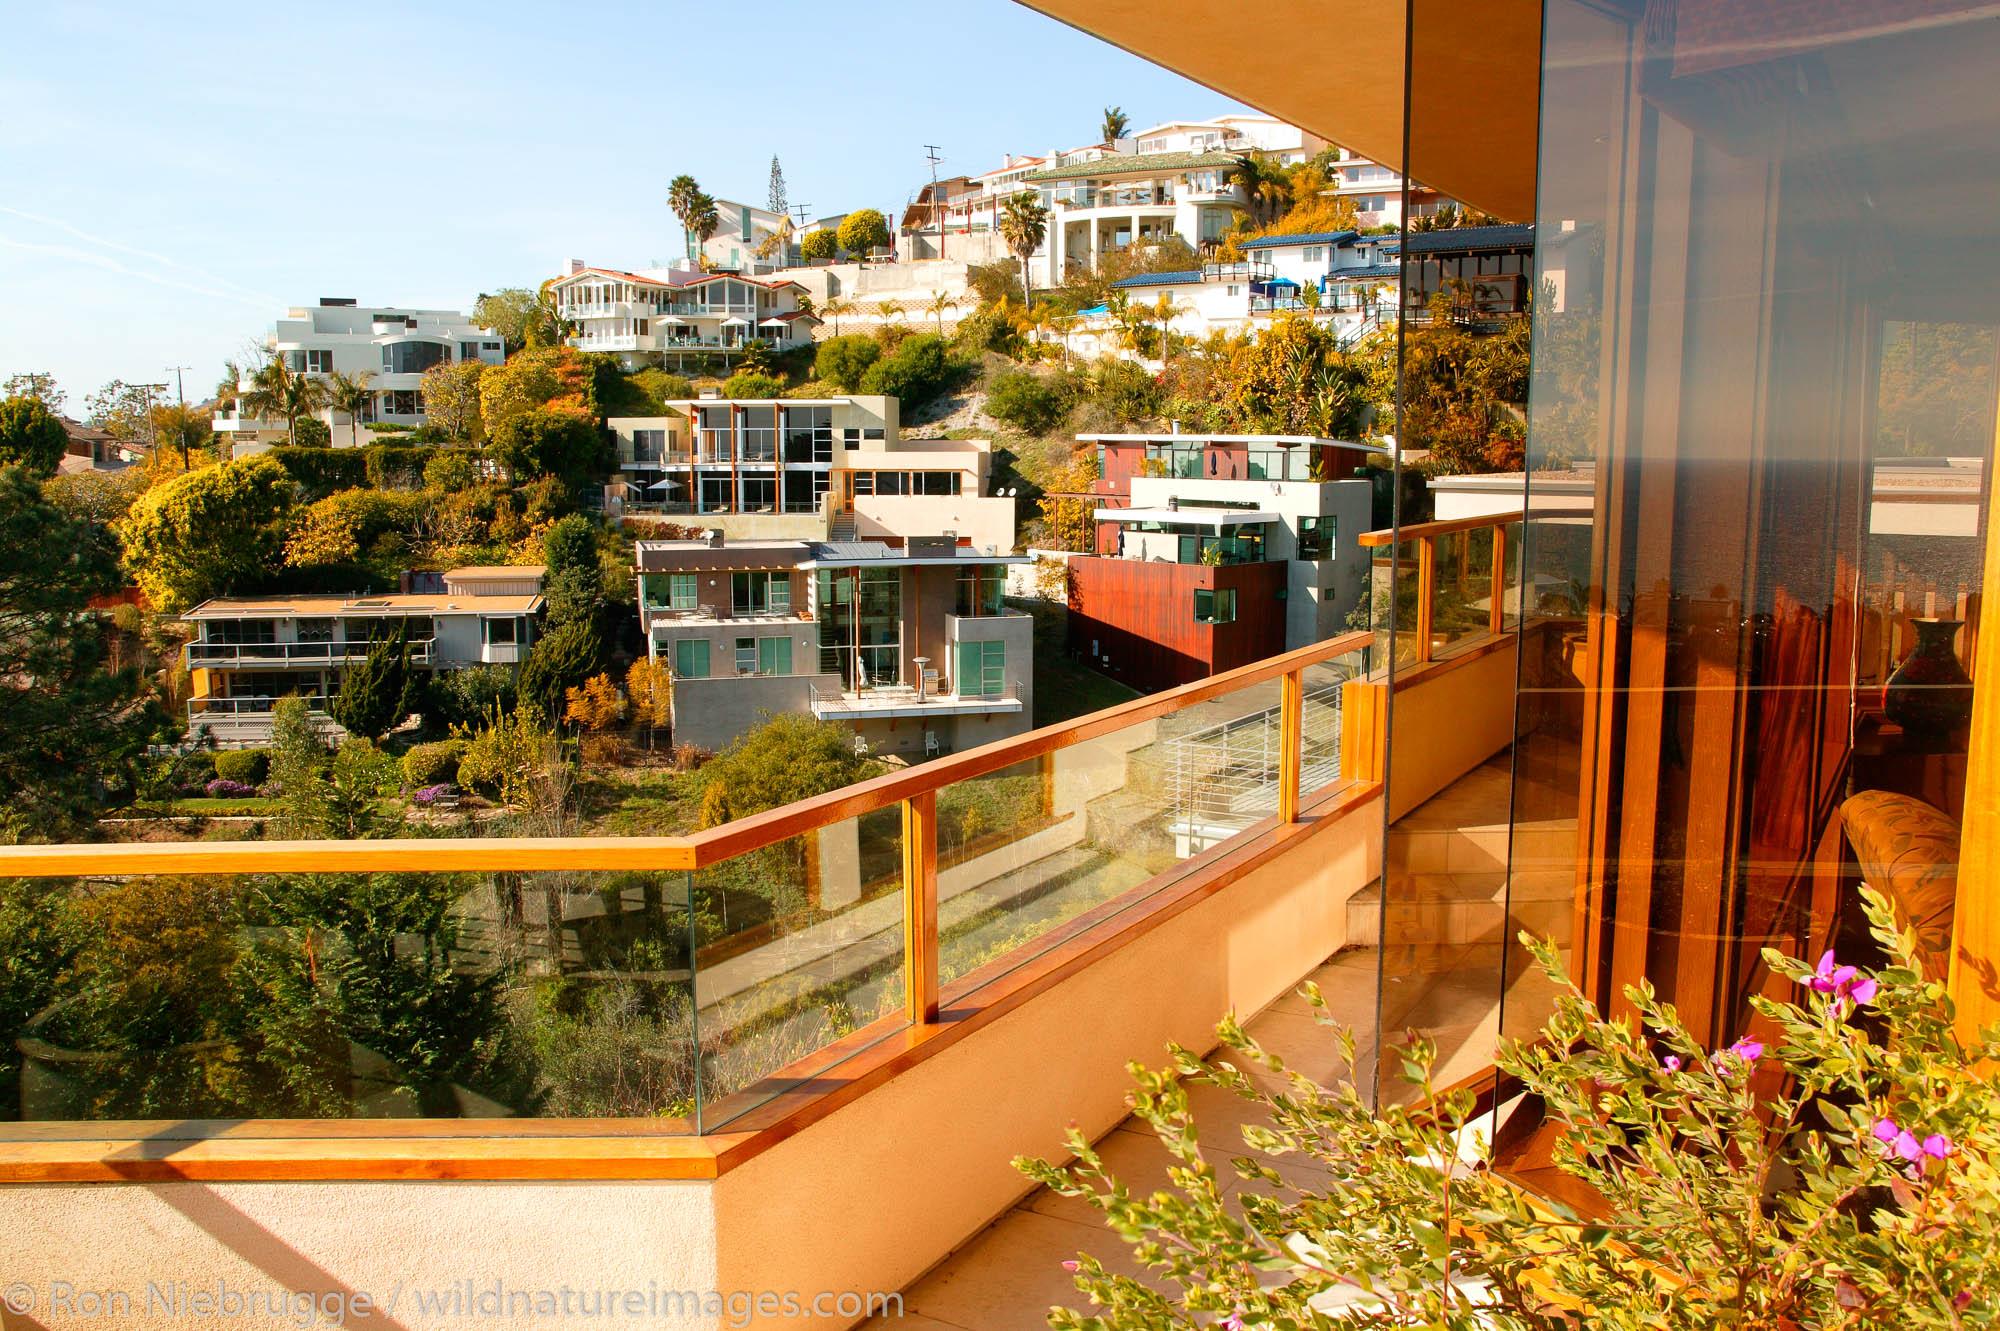 Luxury homes on the hills of Laguna Beach, California.